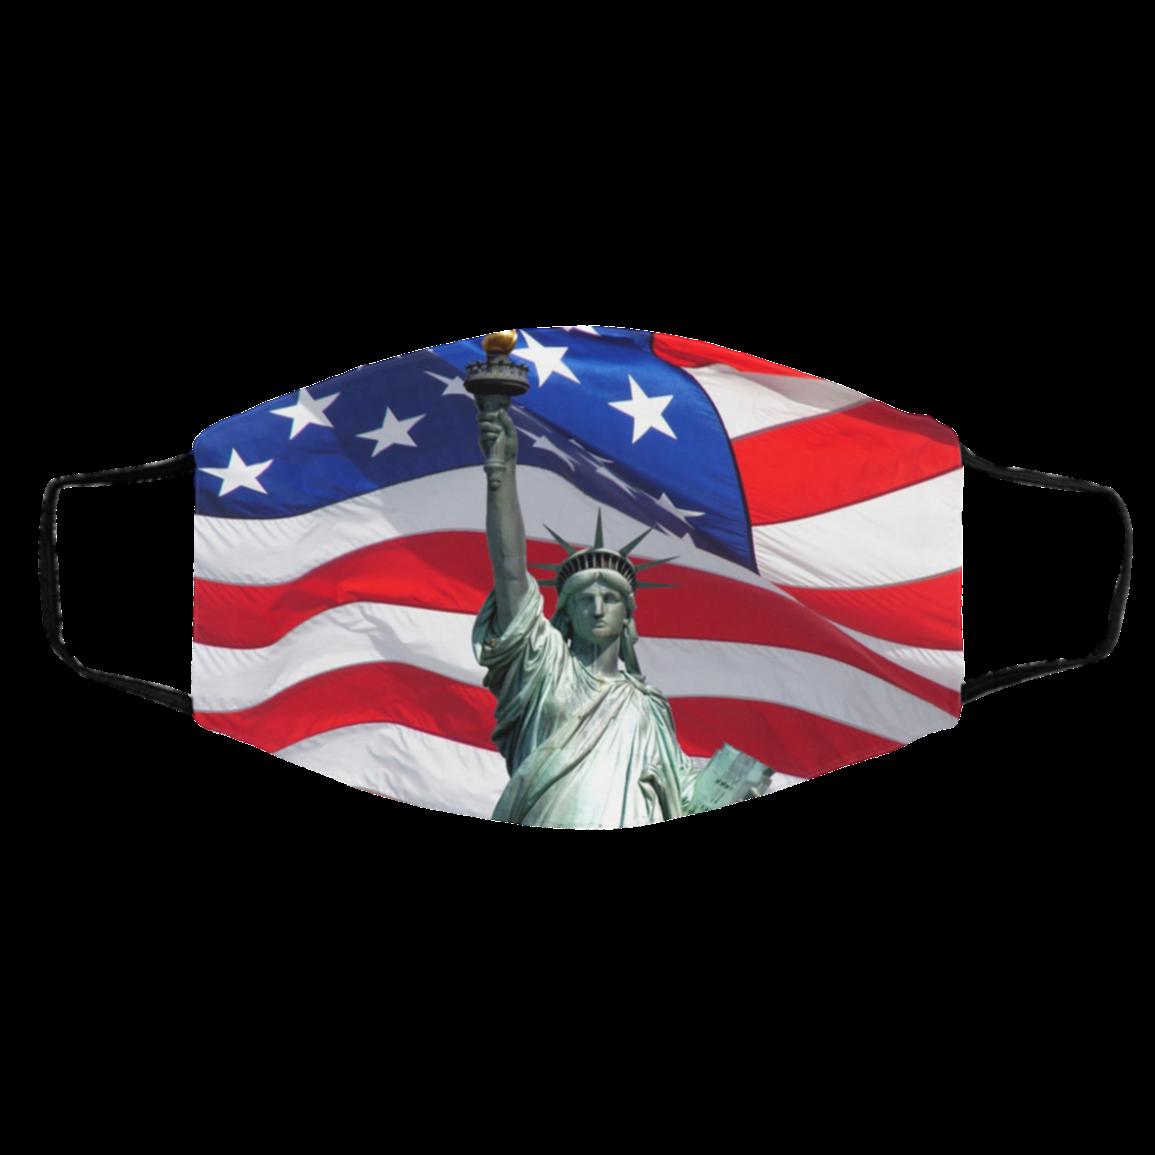 -Sym-bols of Amer-ica Face Mask